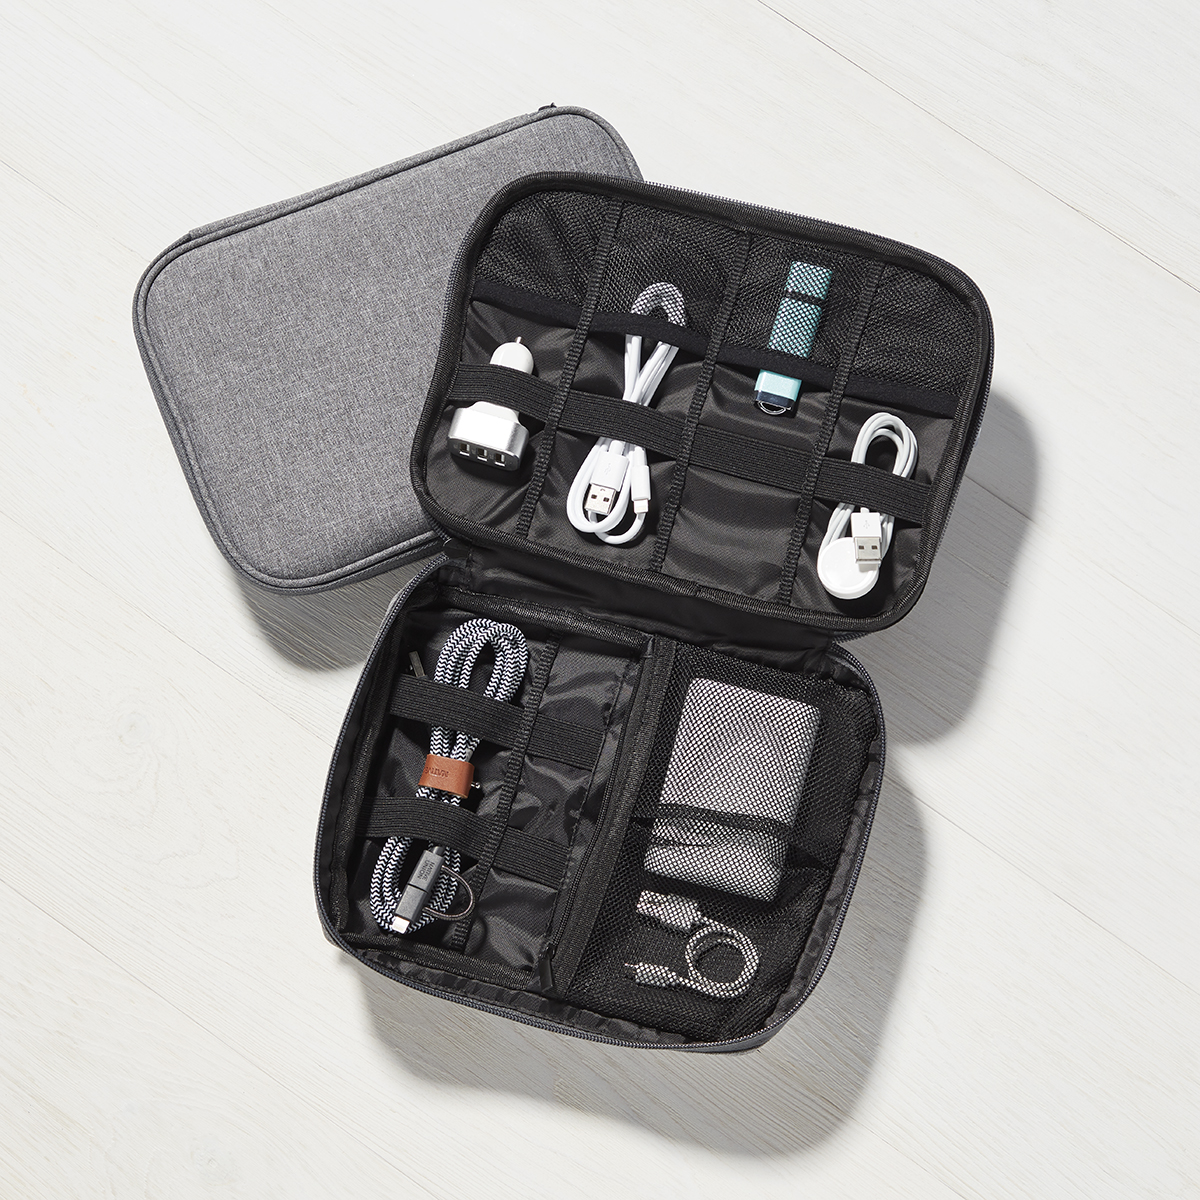 Tech Cord Organizing Pocket